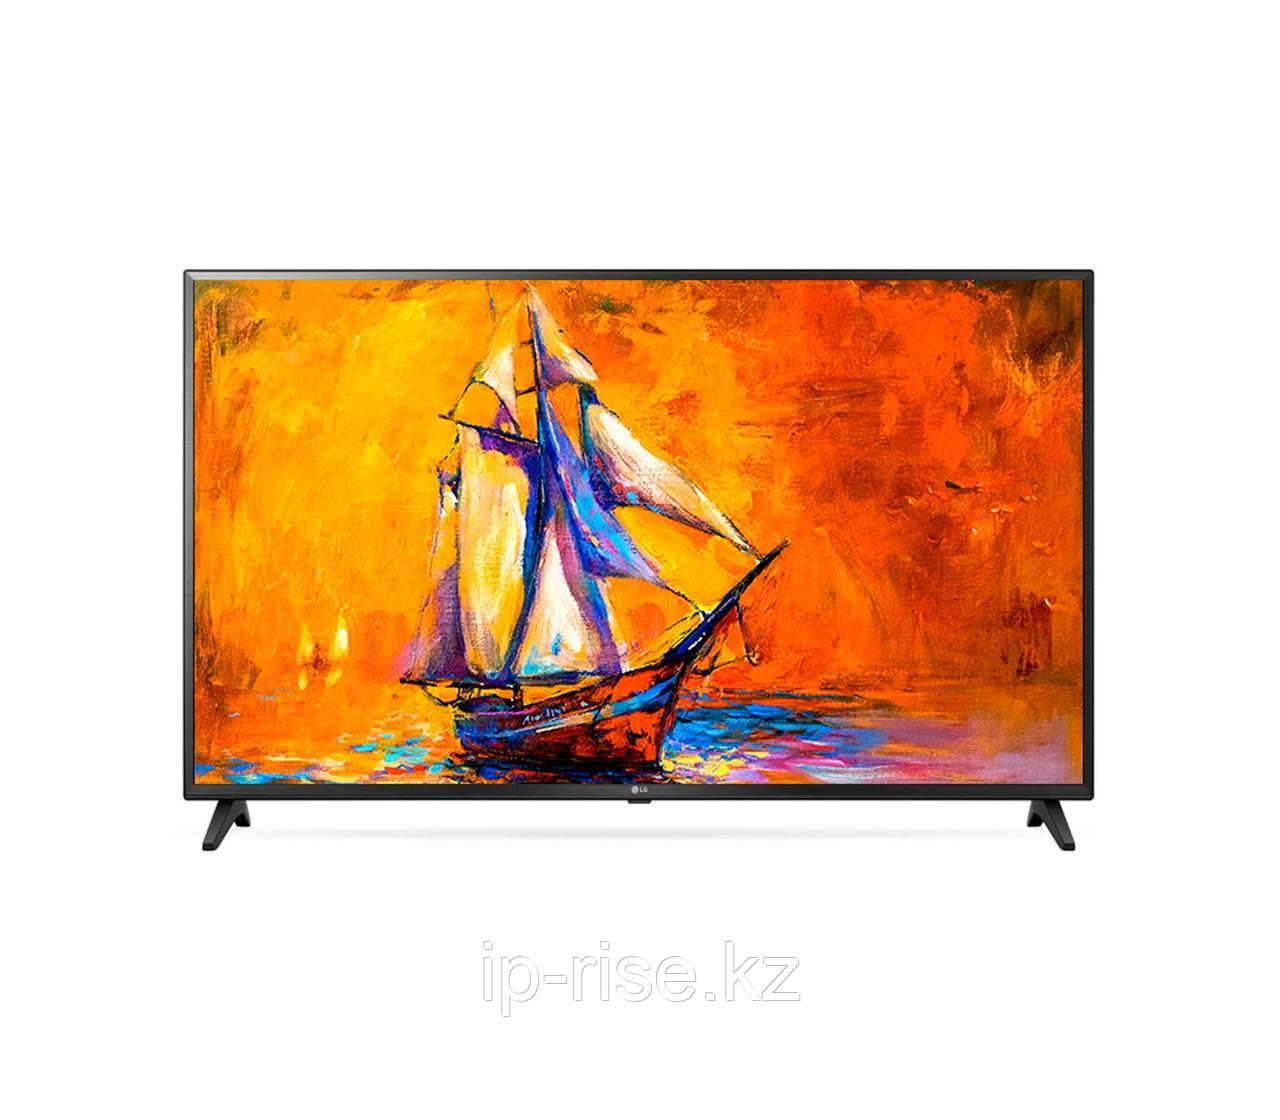 Телевизор LG 43UN74006LA, черный - фото 1